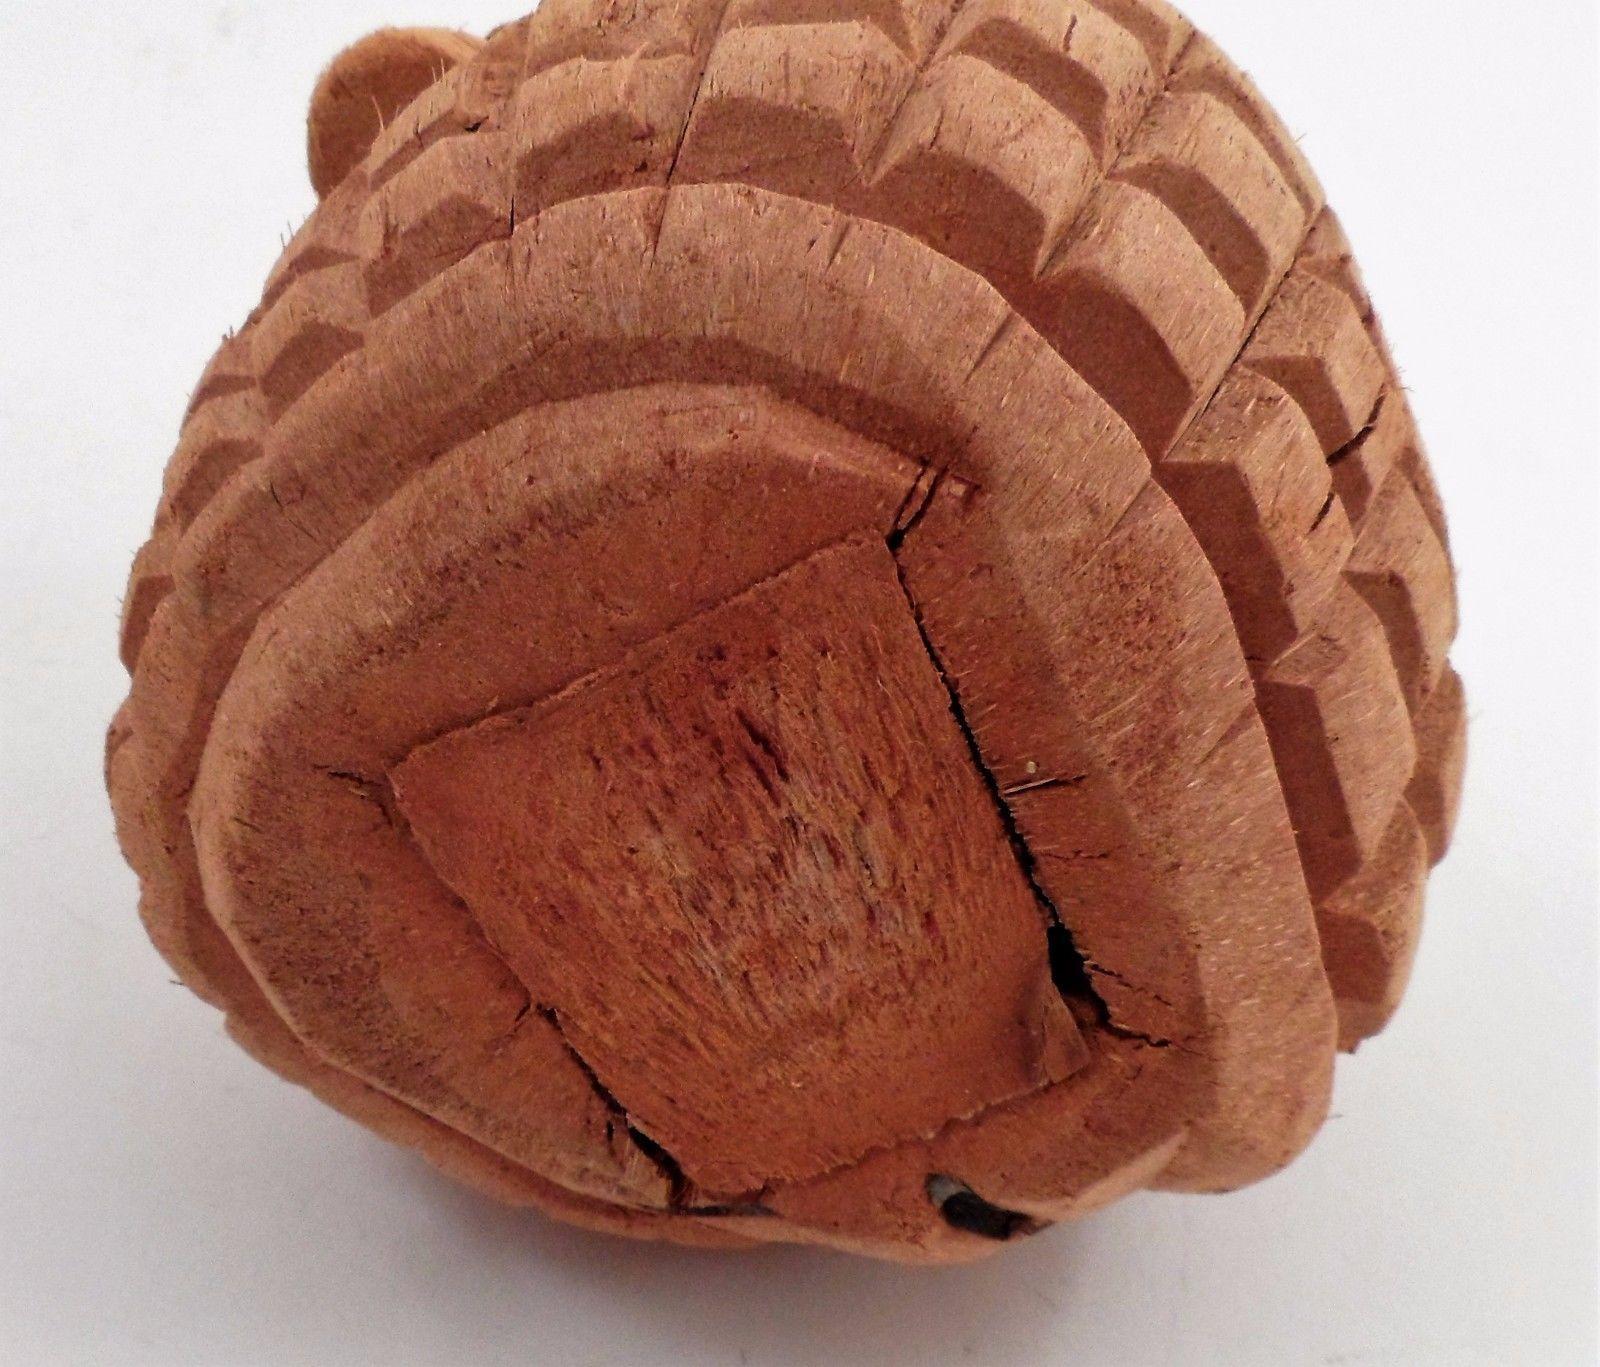 Tropical Polynesian Tiki Bar Decor Real Carved Coconut Alligator w/ Sharp Teeth